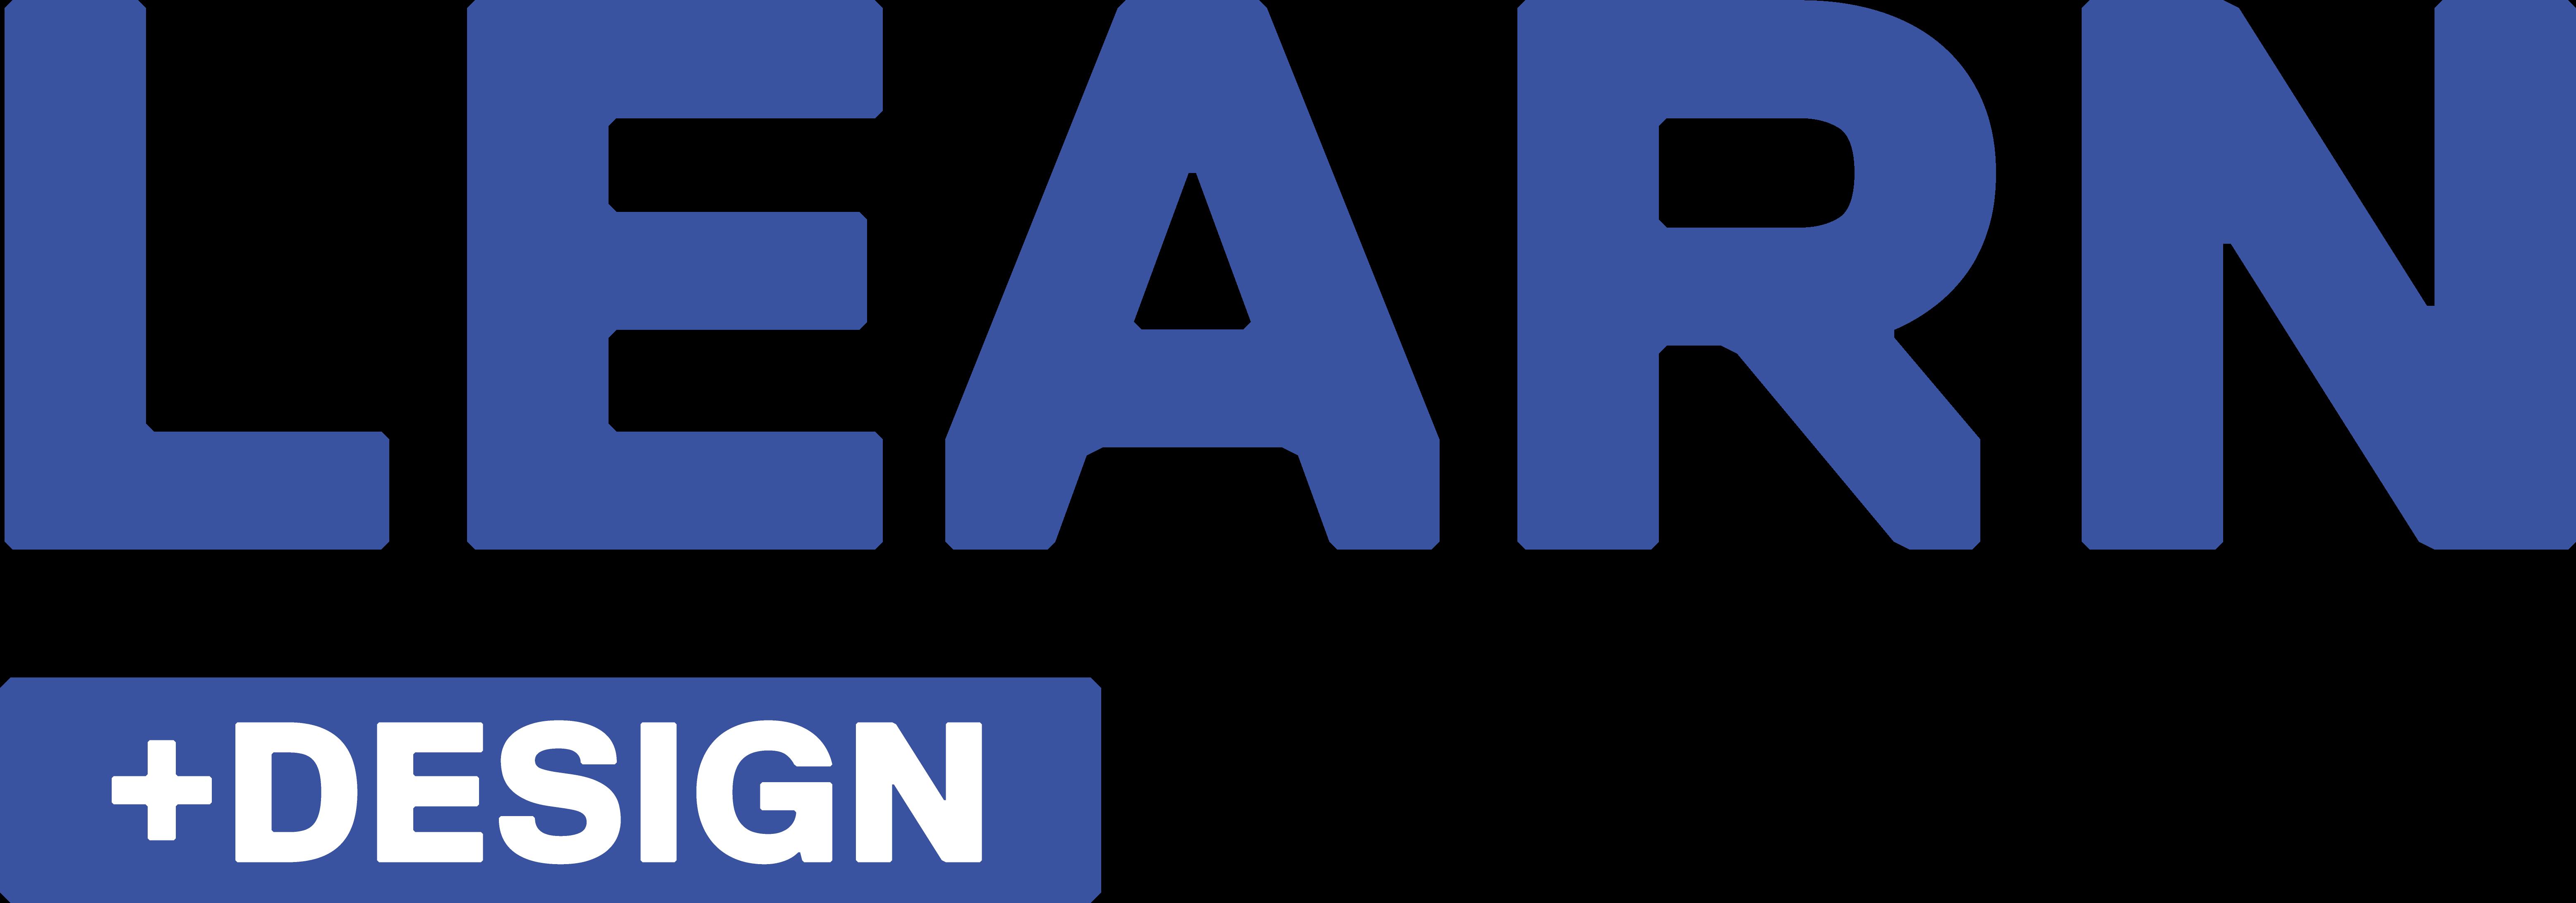 Learnplusdesign.com